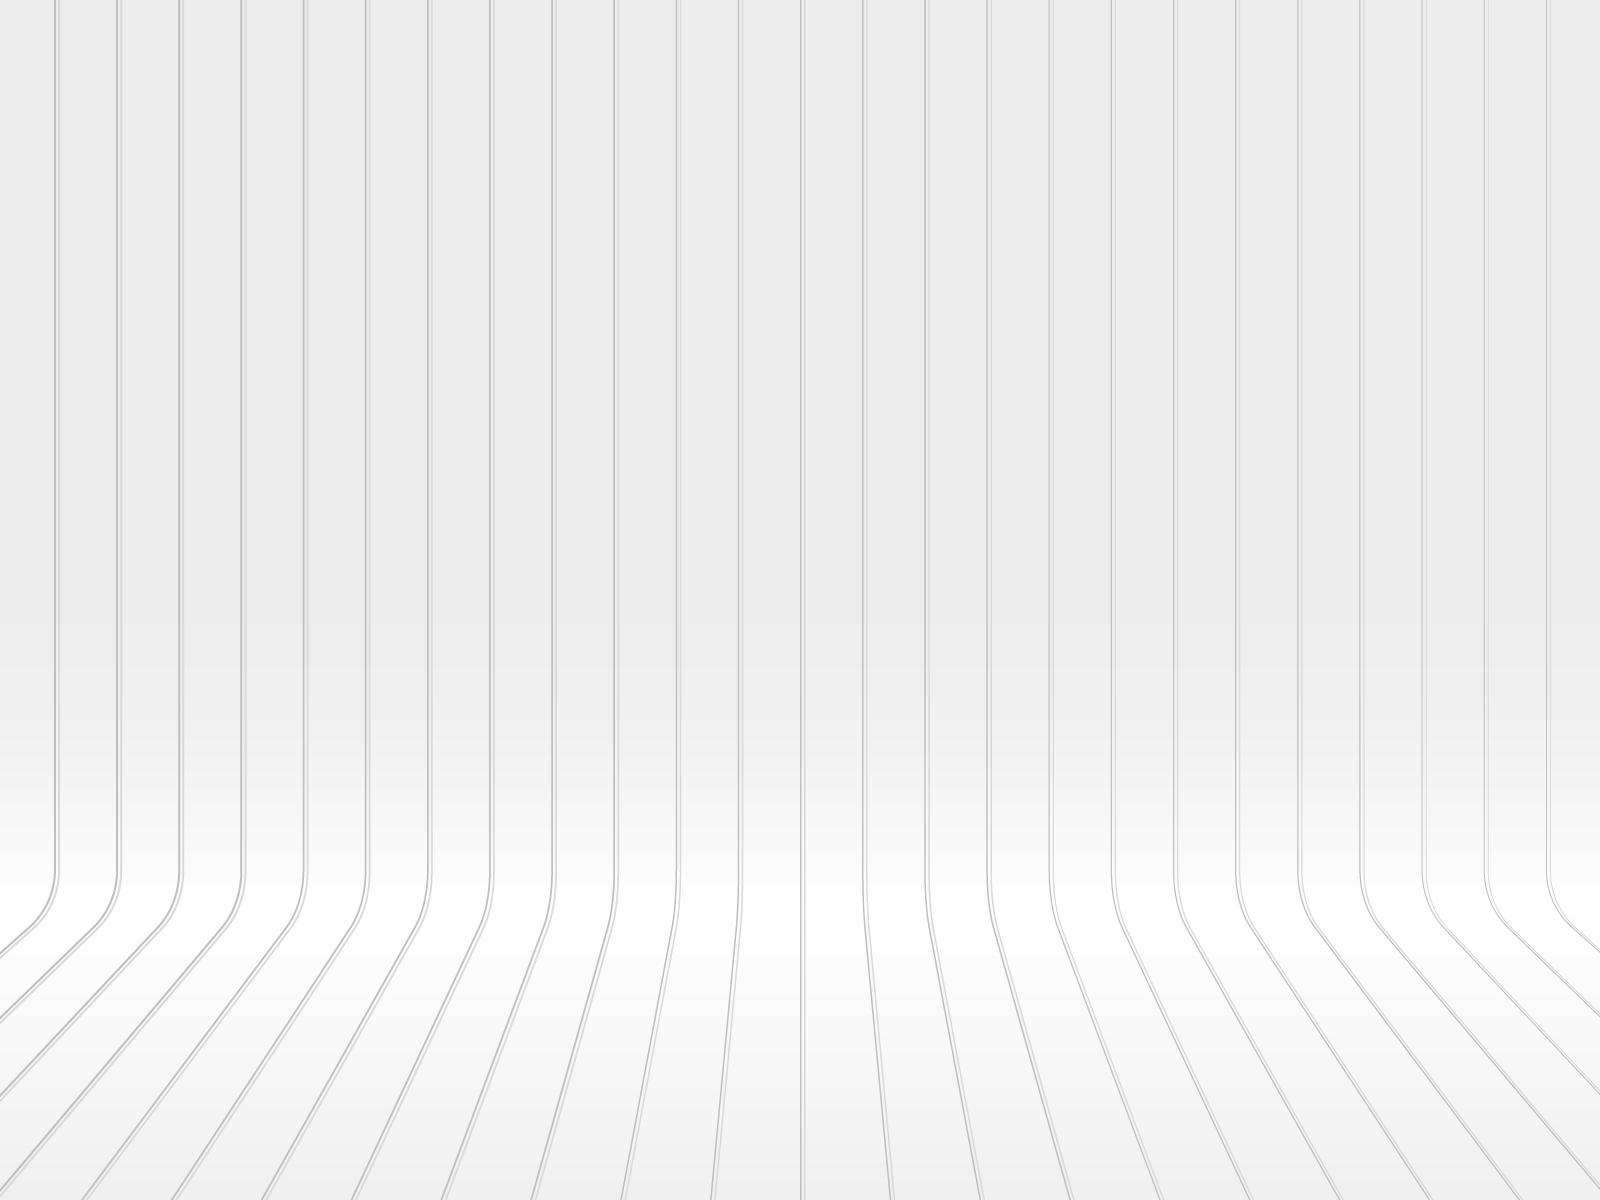 Hintergrundbilder : Holz, Text, einfach, Muster, Kreis, Papier ...